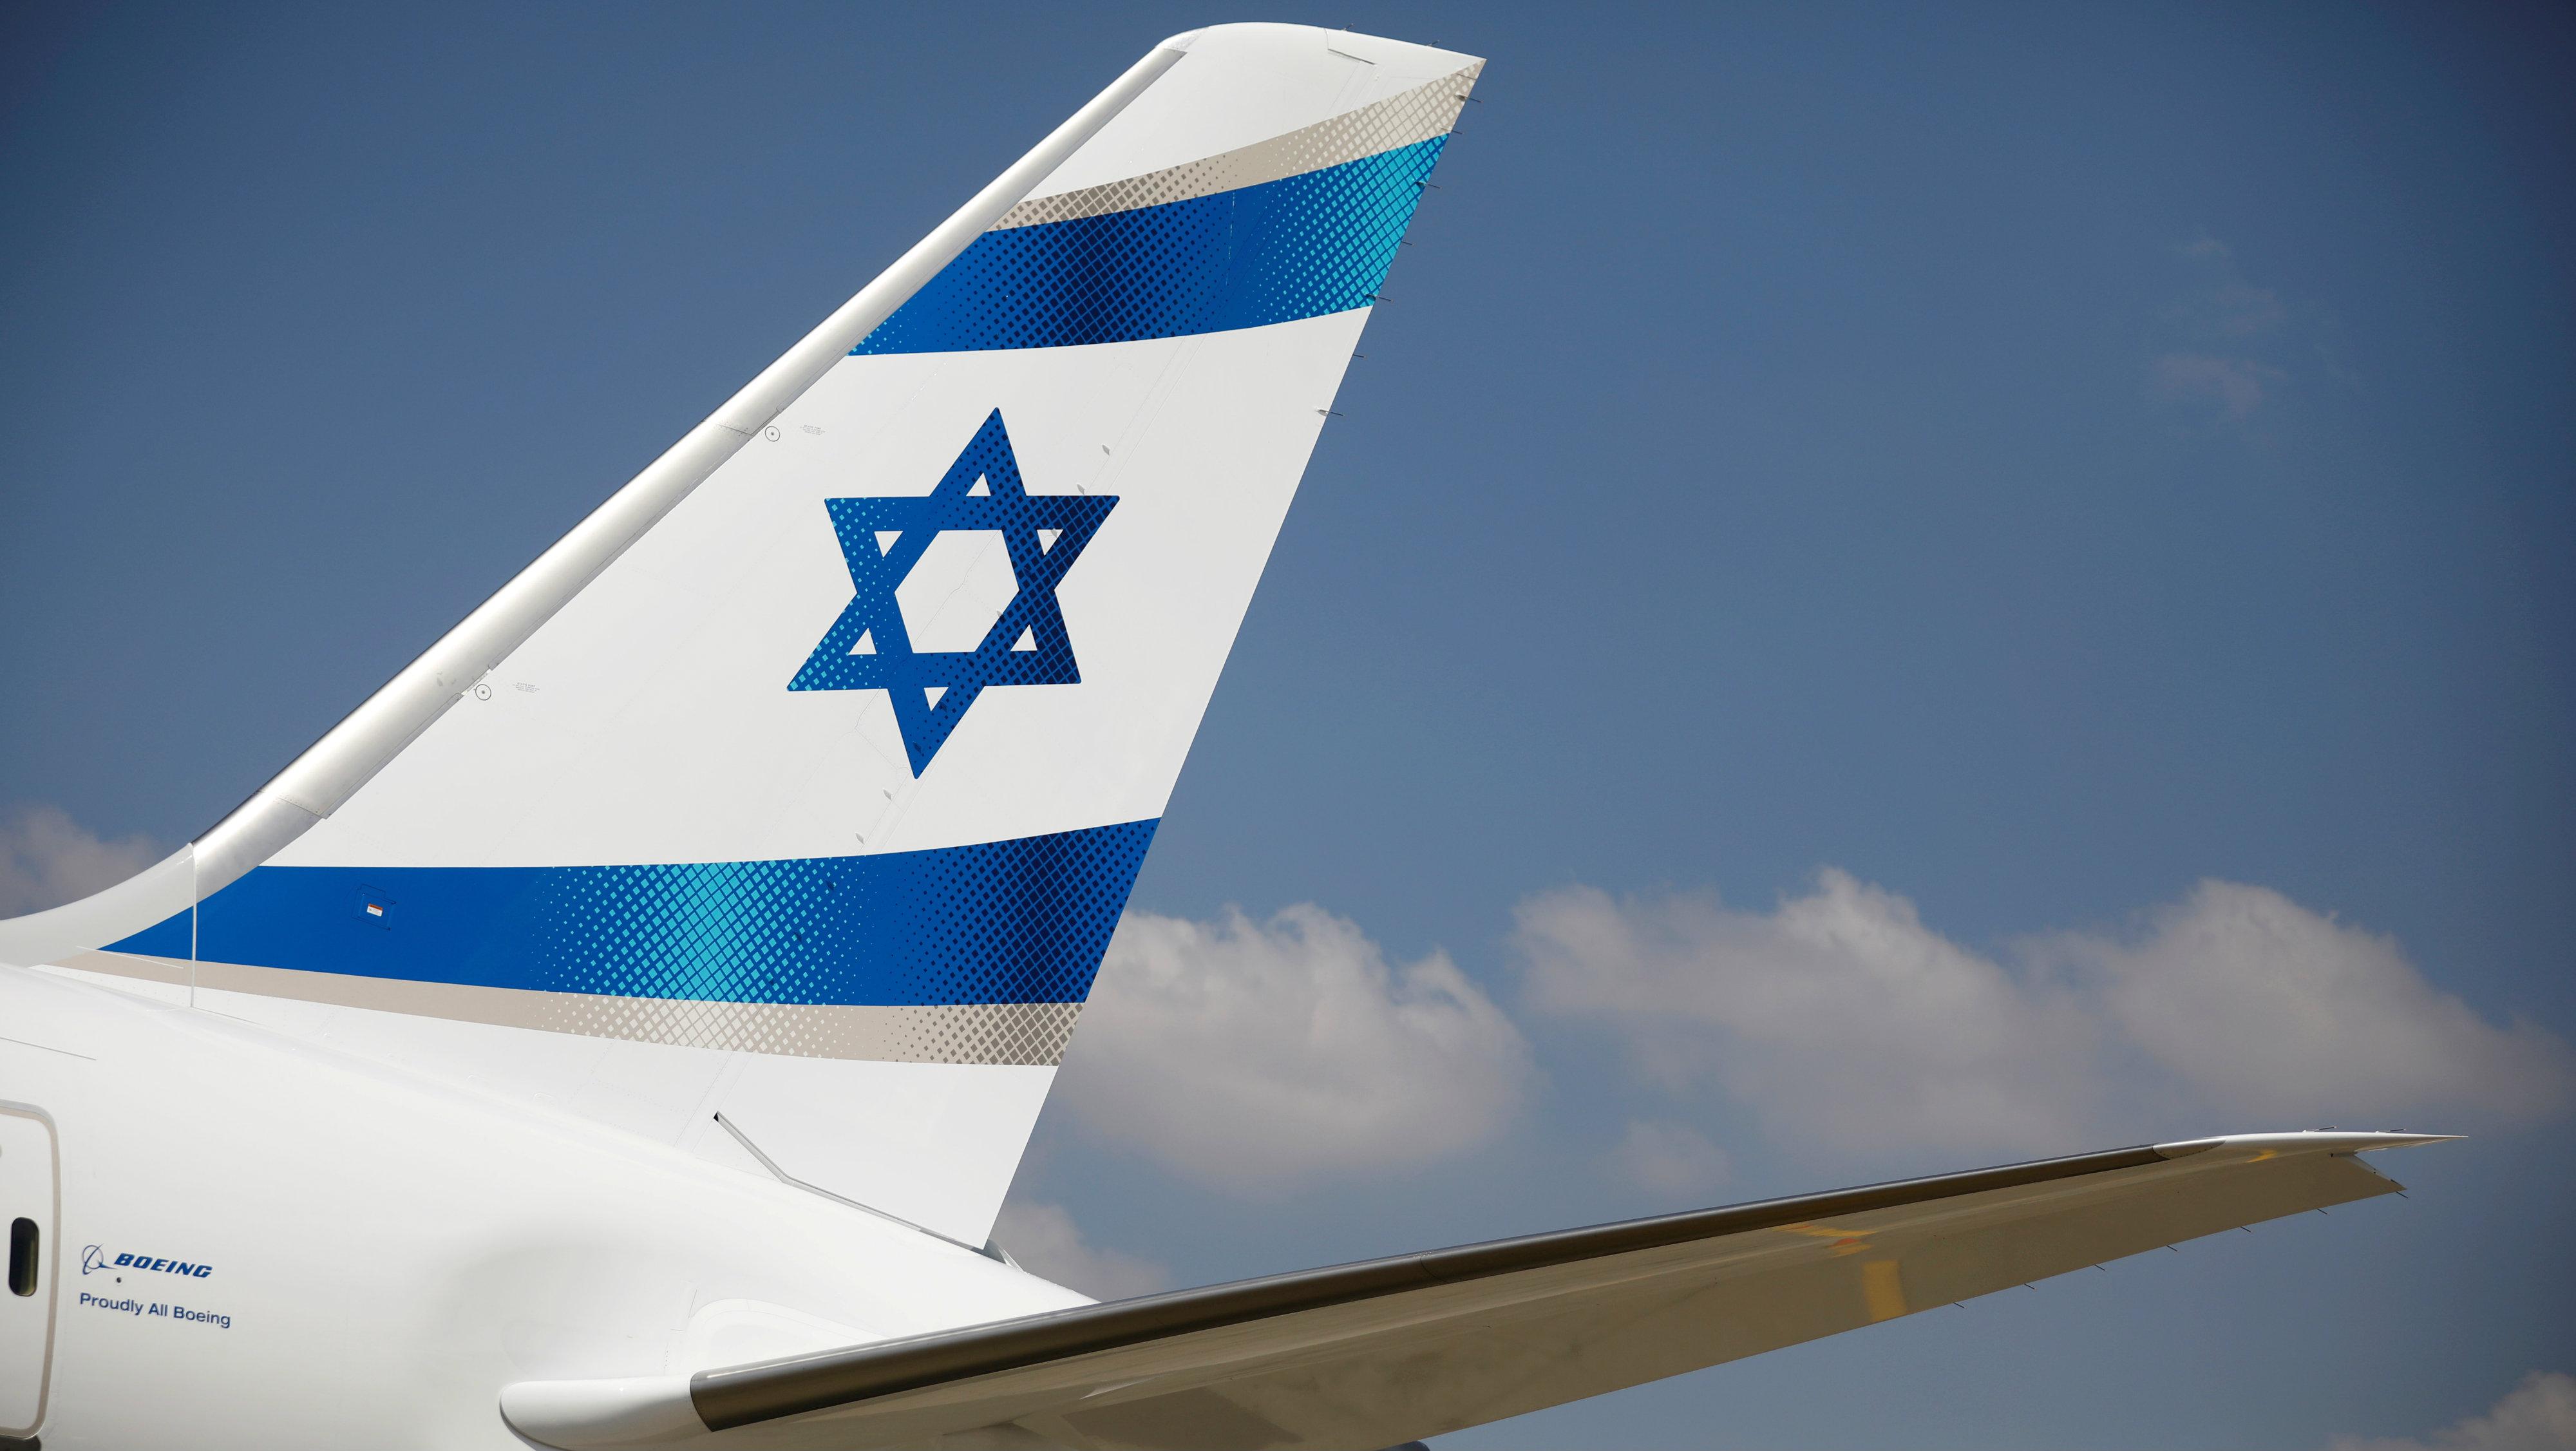 Star of David airplane wing